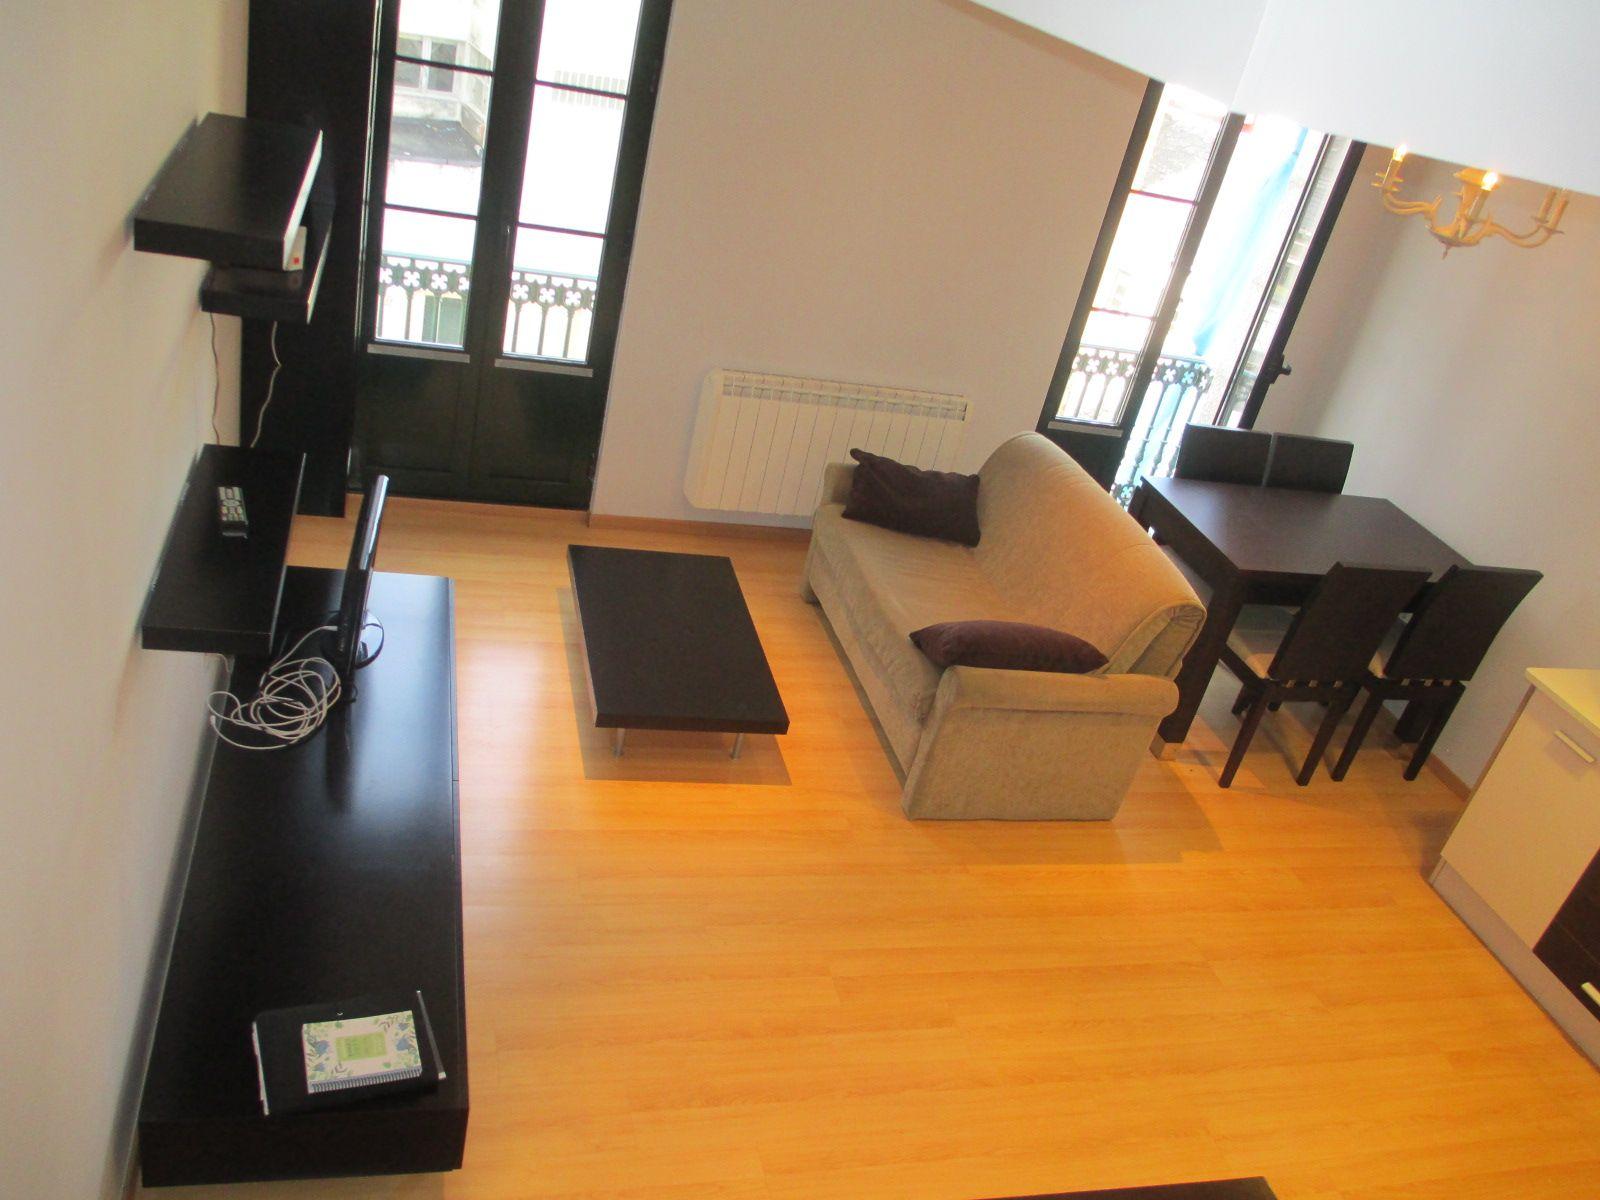 Alquiler Apartamento En Lugo Centro